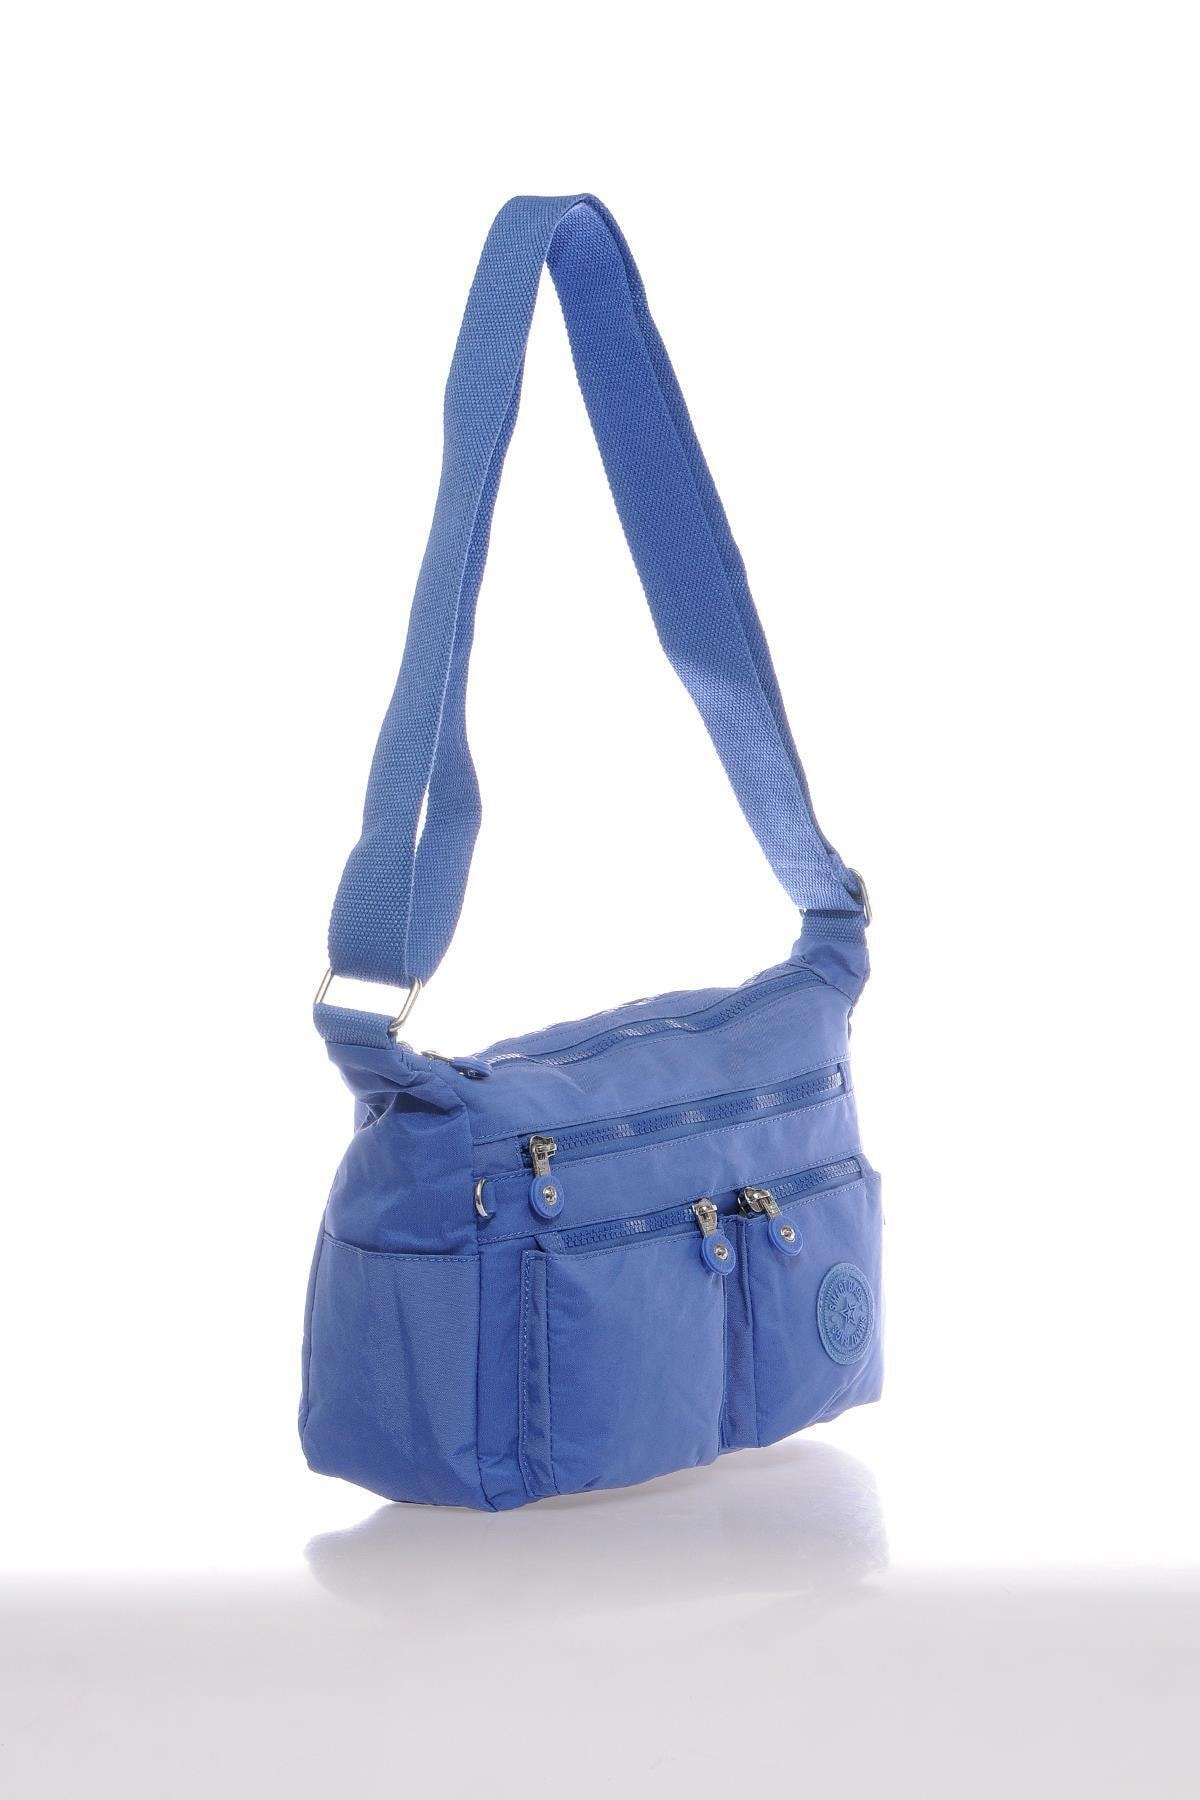 SMART BAGS Smb3065-0031 Mavi Kadın Çapraz Çanta 2